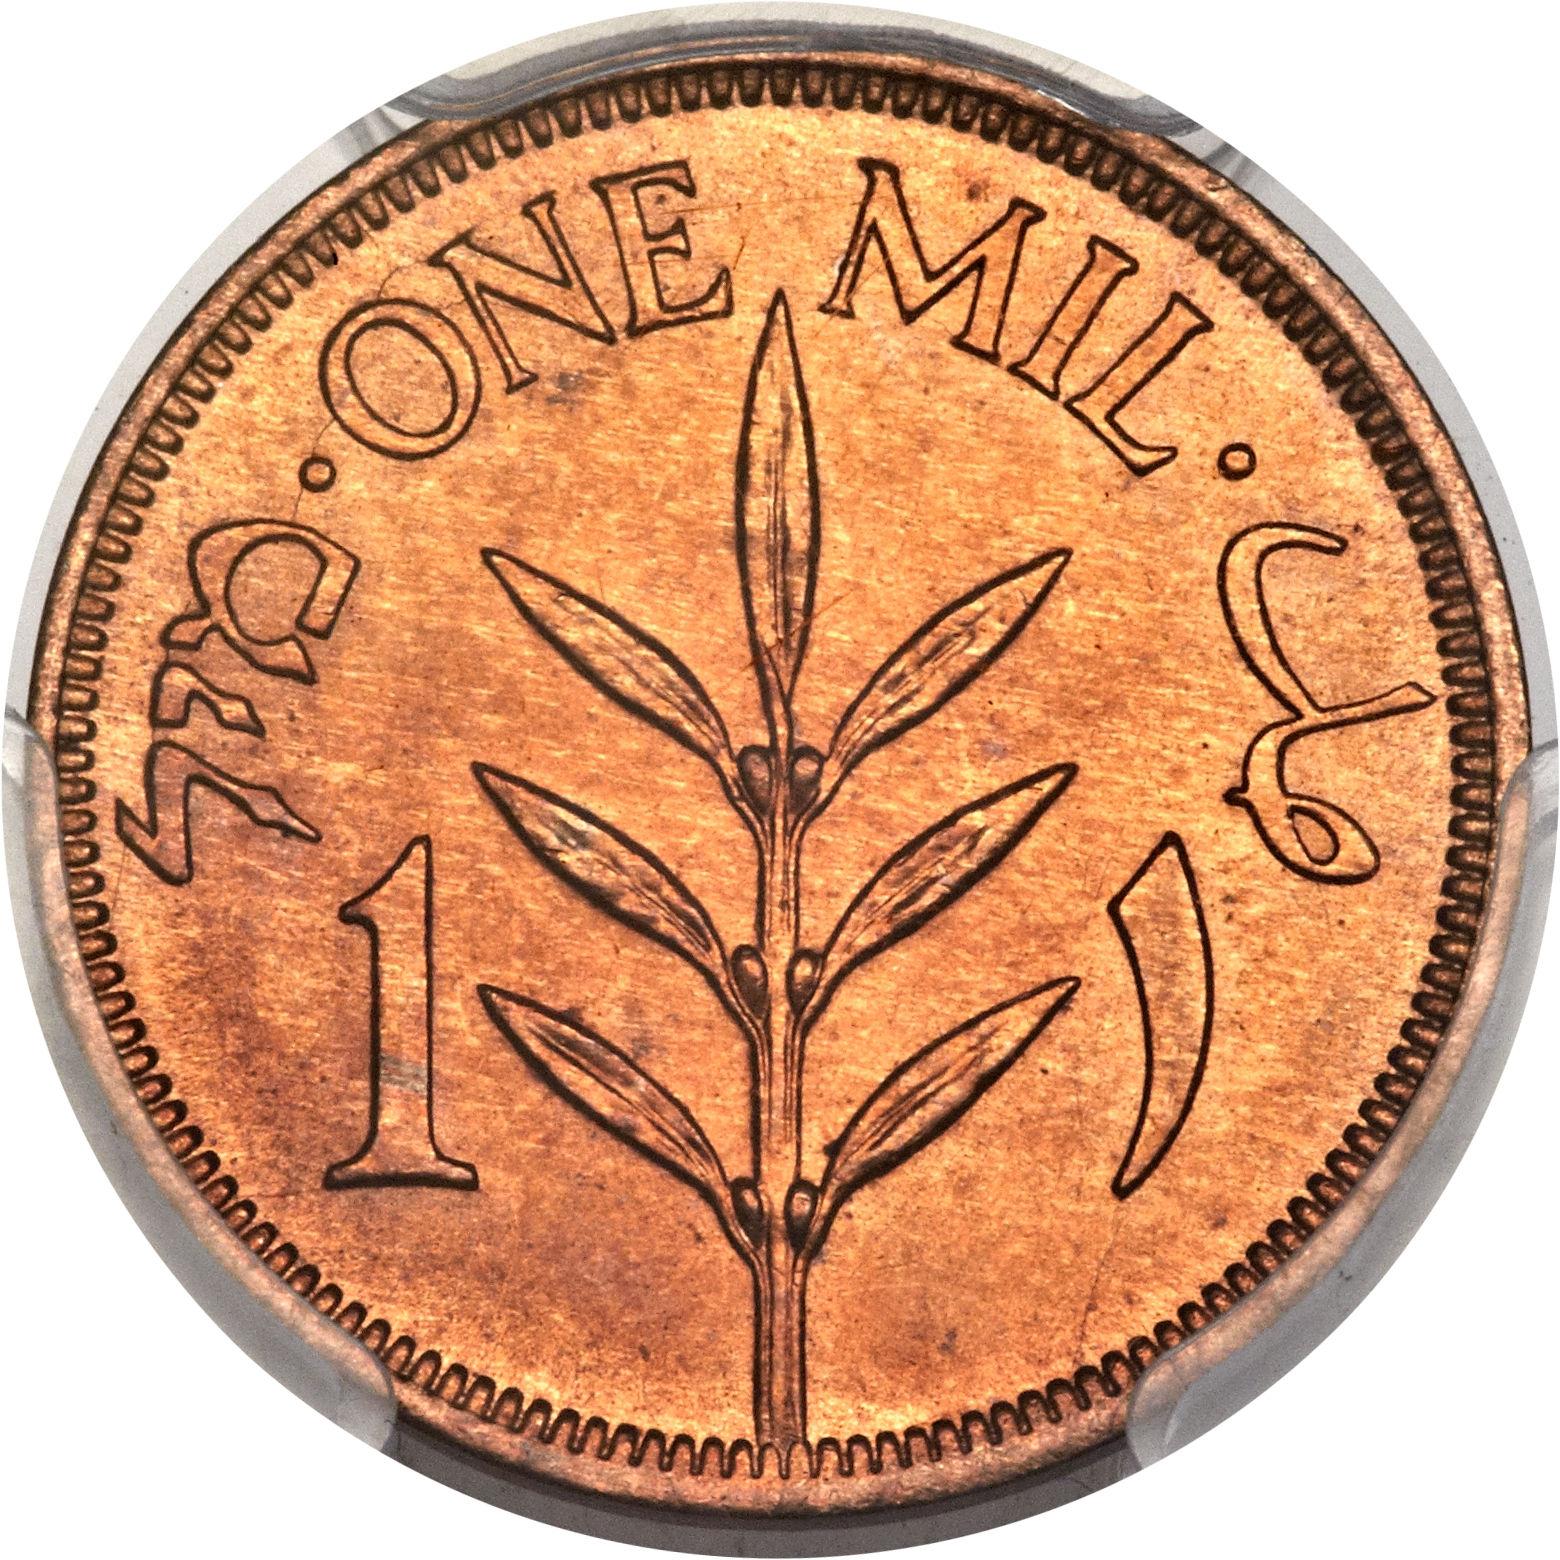 1 Mil - British Palestine – Numista